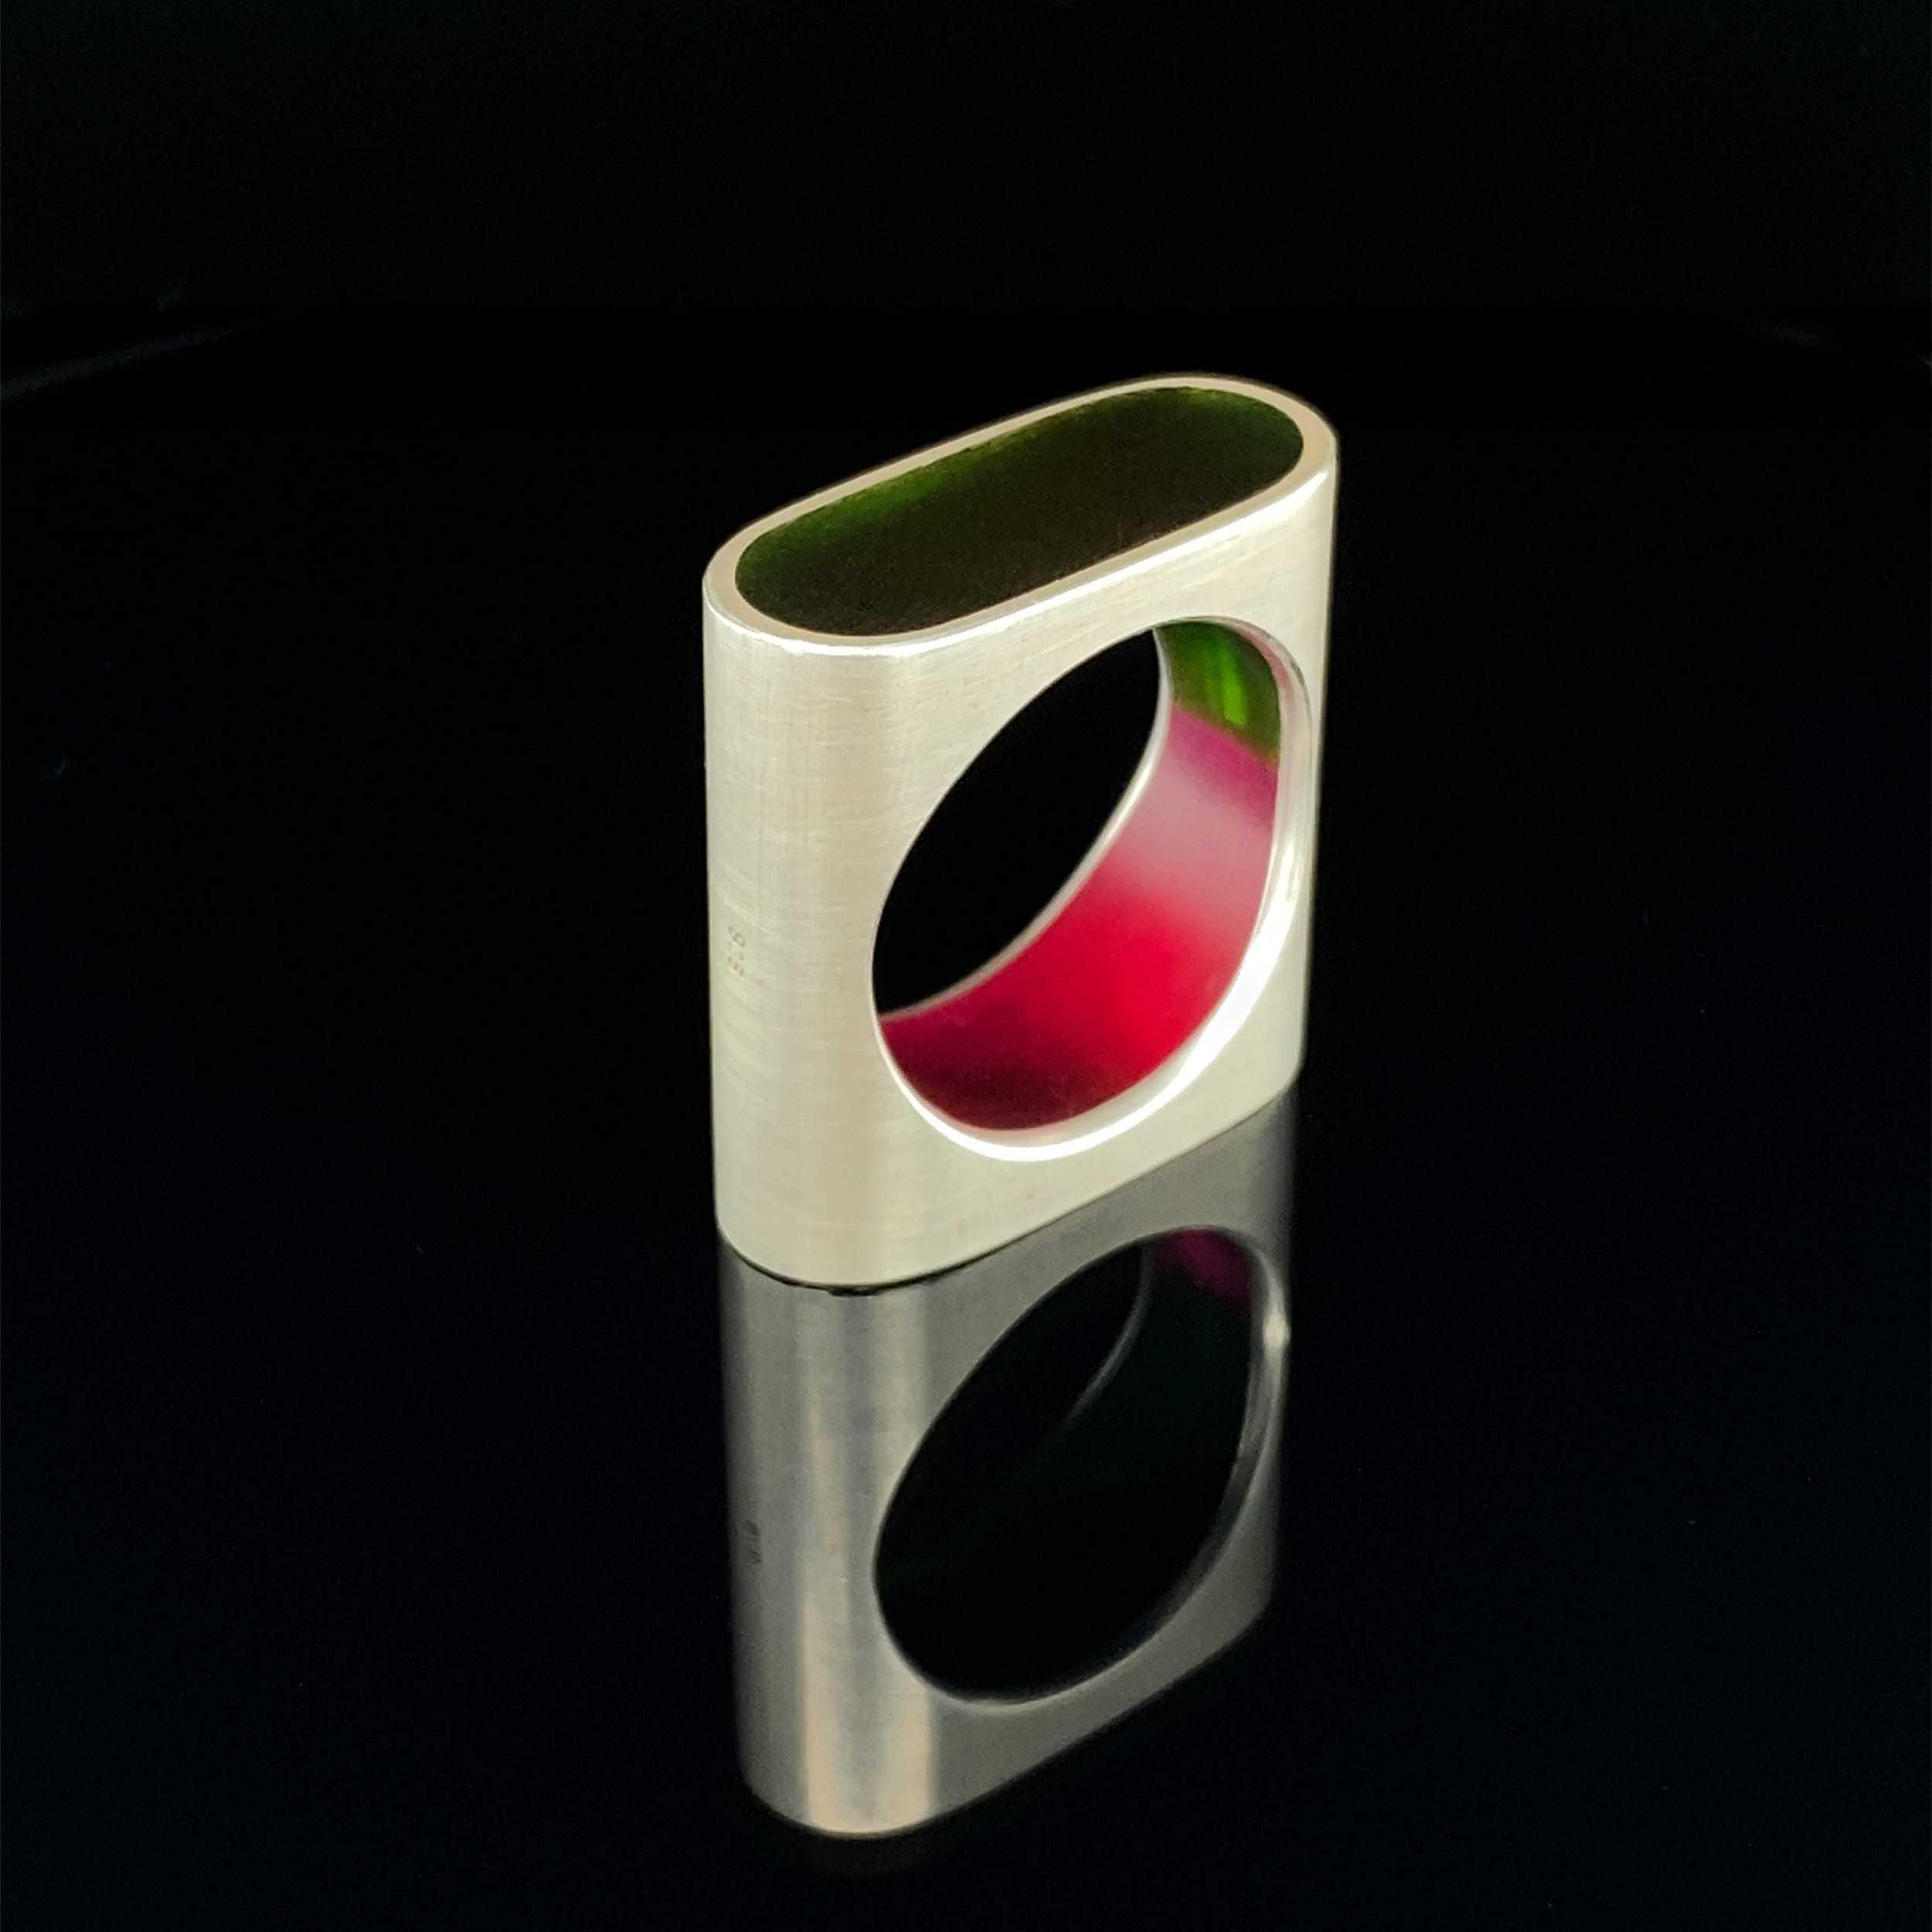 monika jakubec silver resin capsule ring pink green designyard contemporary jewellery gallery dublin ireland